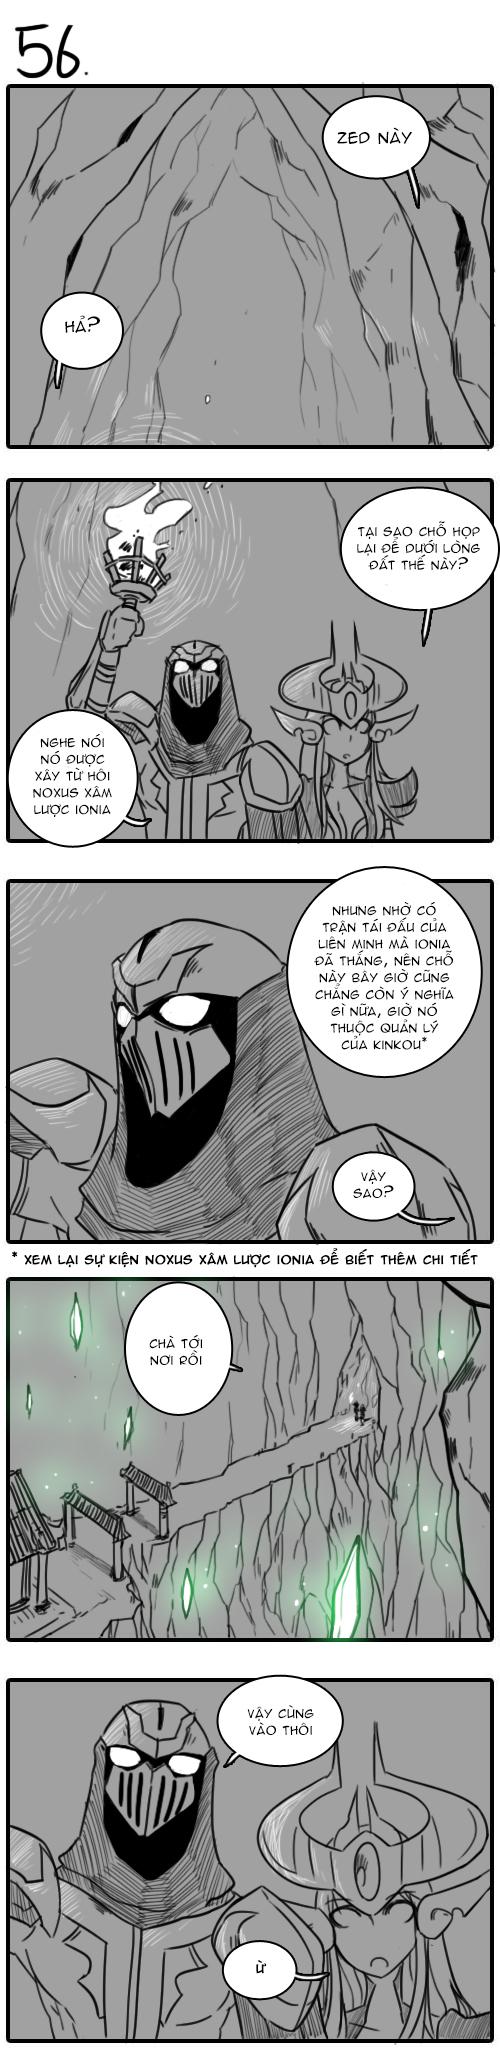 comic_lmht_2_9_1